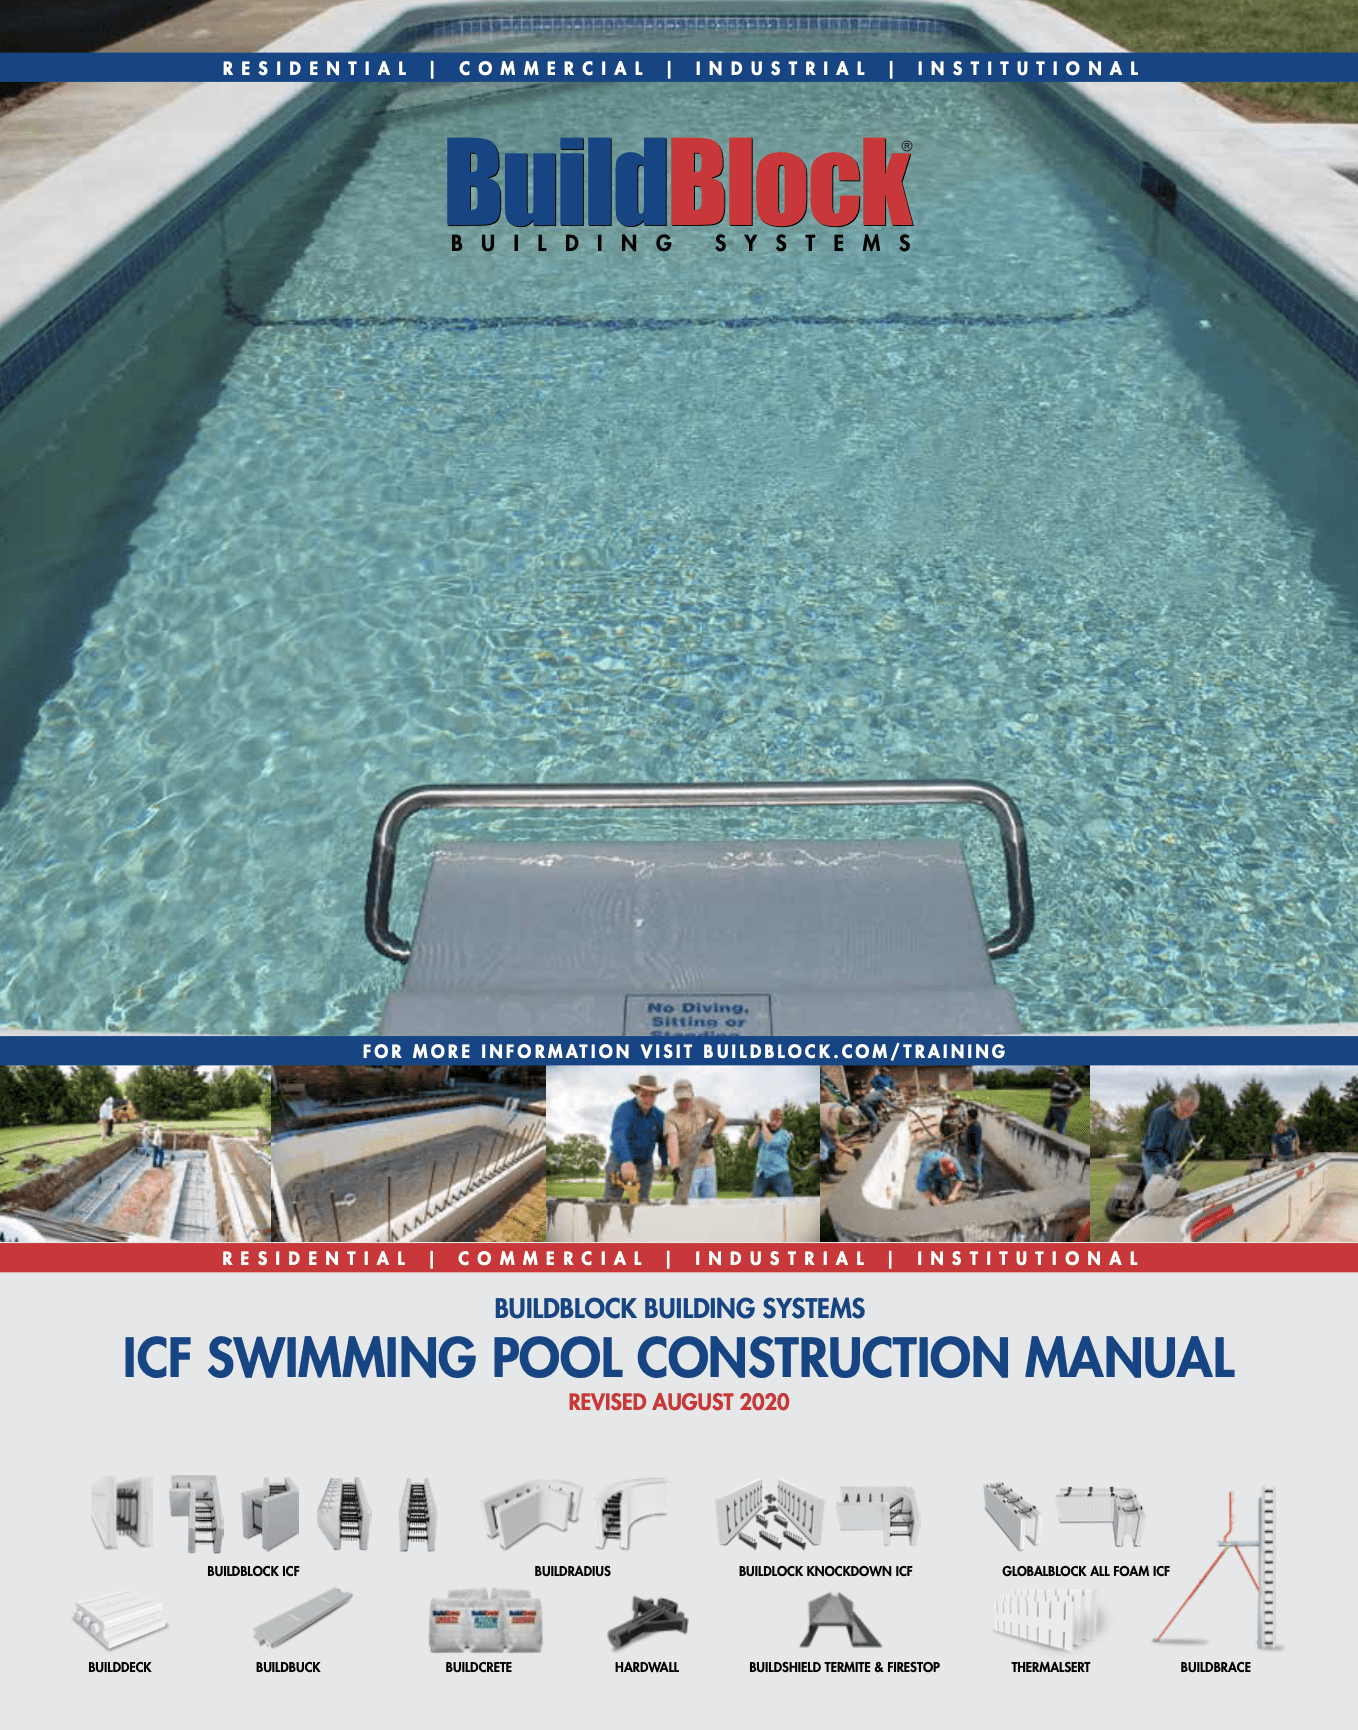 The BuildBlock ICF Swimming Pool Construction Manual